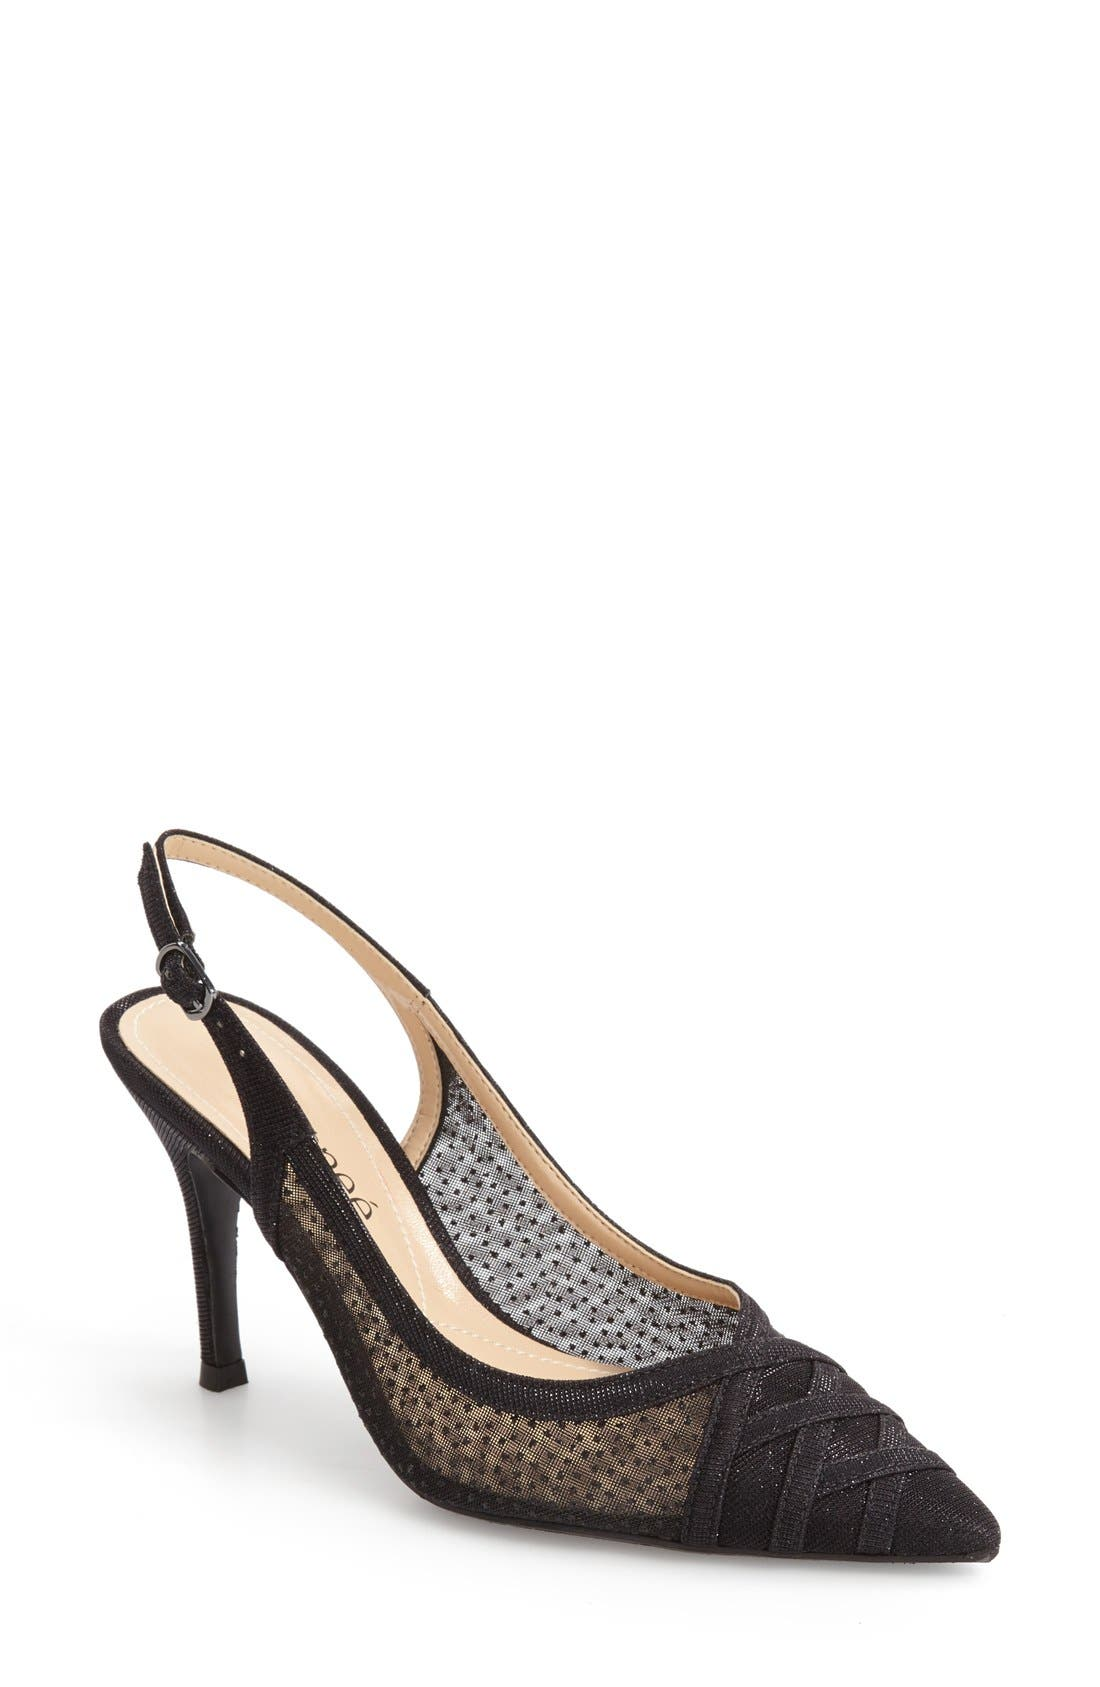 J. Renee Savina Pointed Toe Slingback Pump,                             Main thumbnail 1, color,                             Black Glitter